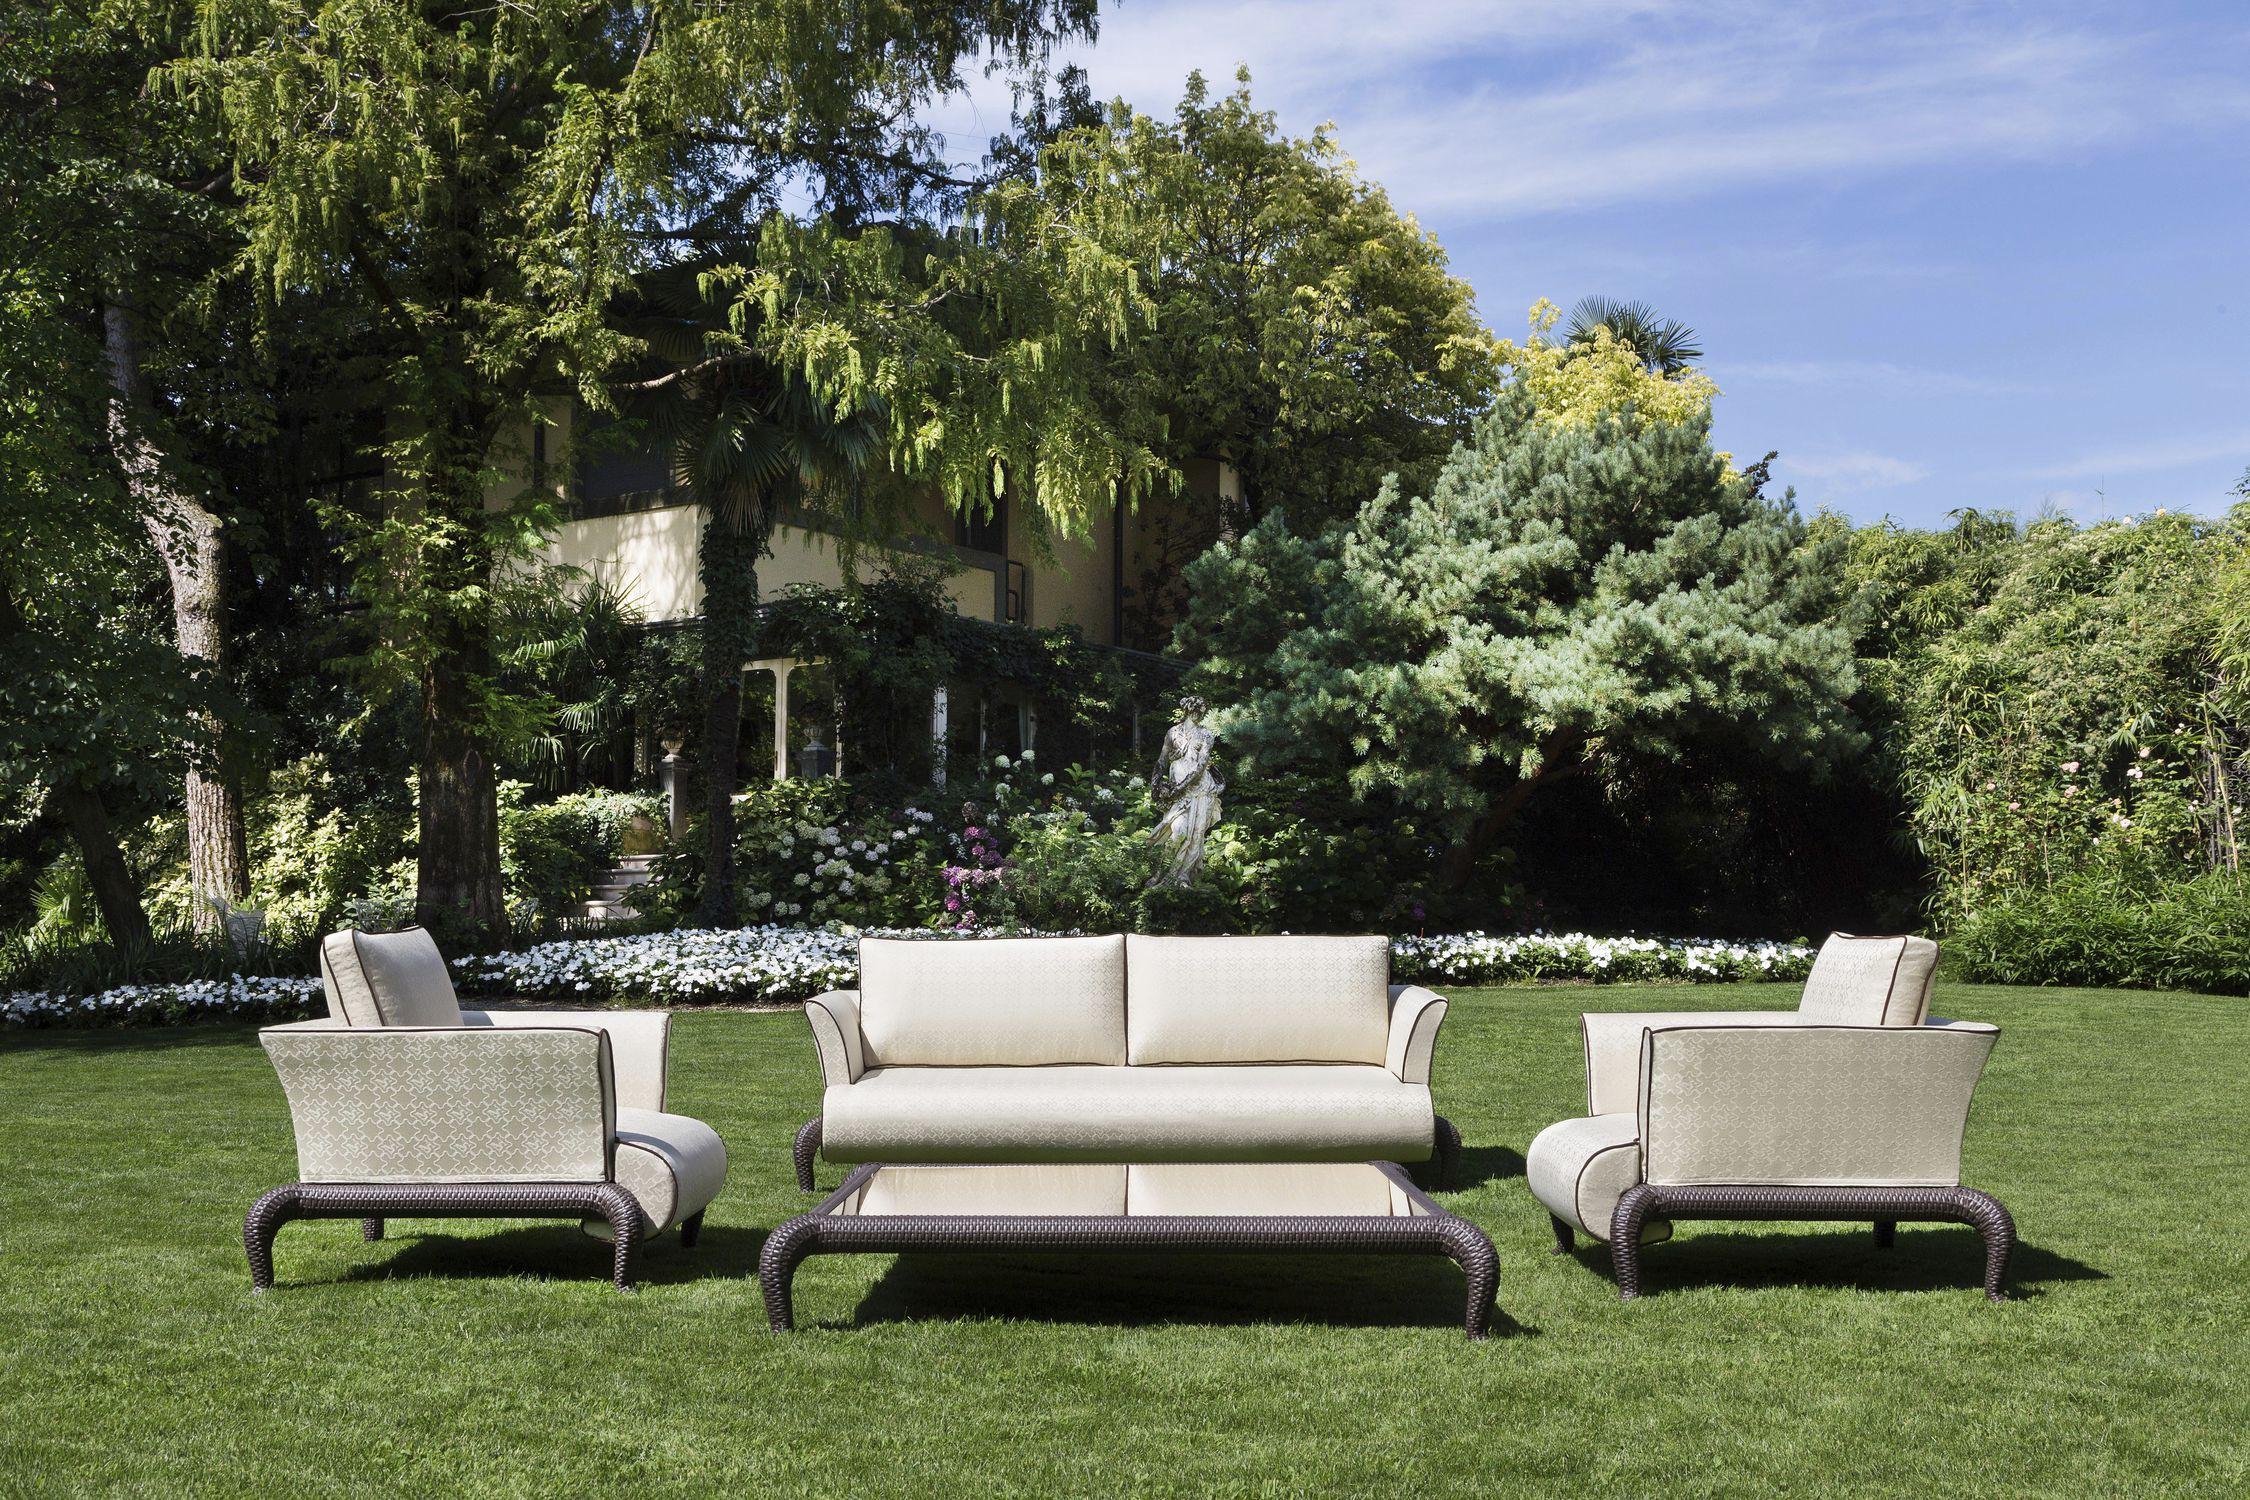 Traditional sofa - CANOPO - Samuele Mazza by DFN srl - garden